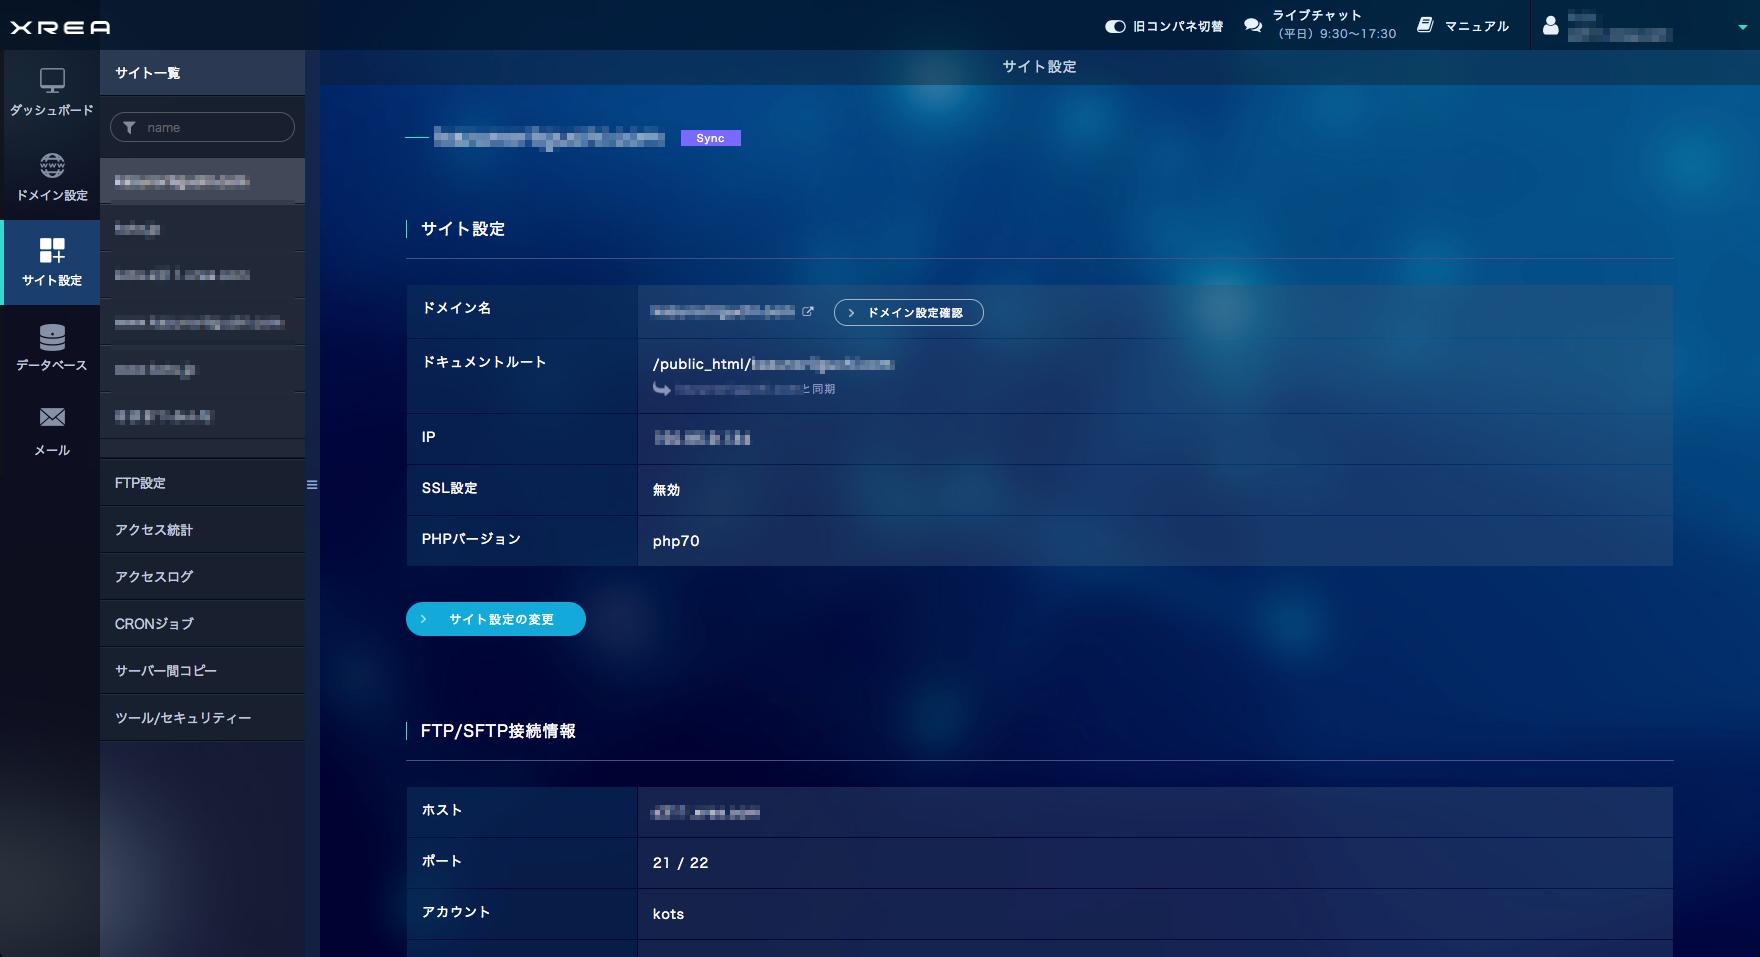 XREAの新仕様のサーバーへマイグレーション時のWordPressの不具合への管理画面の対処箇所